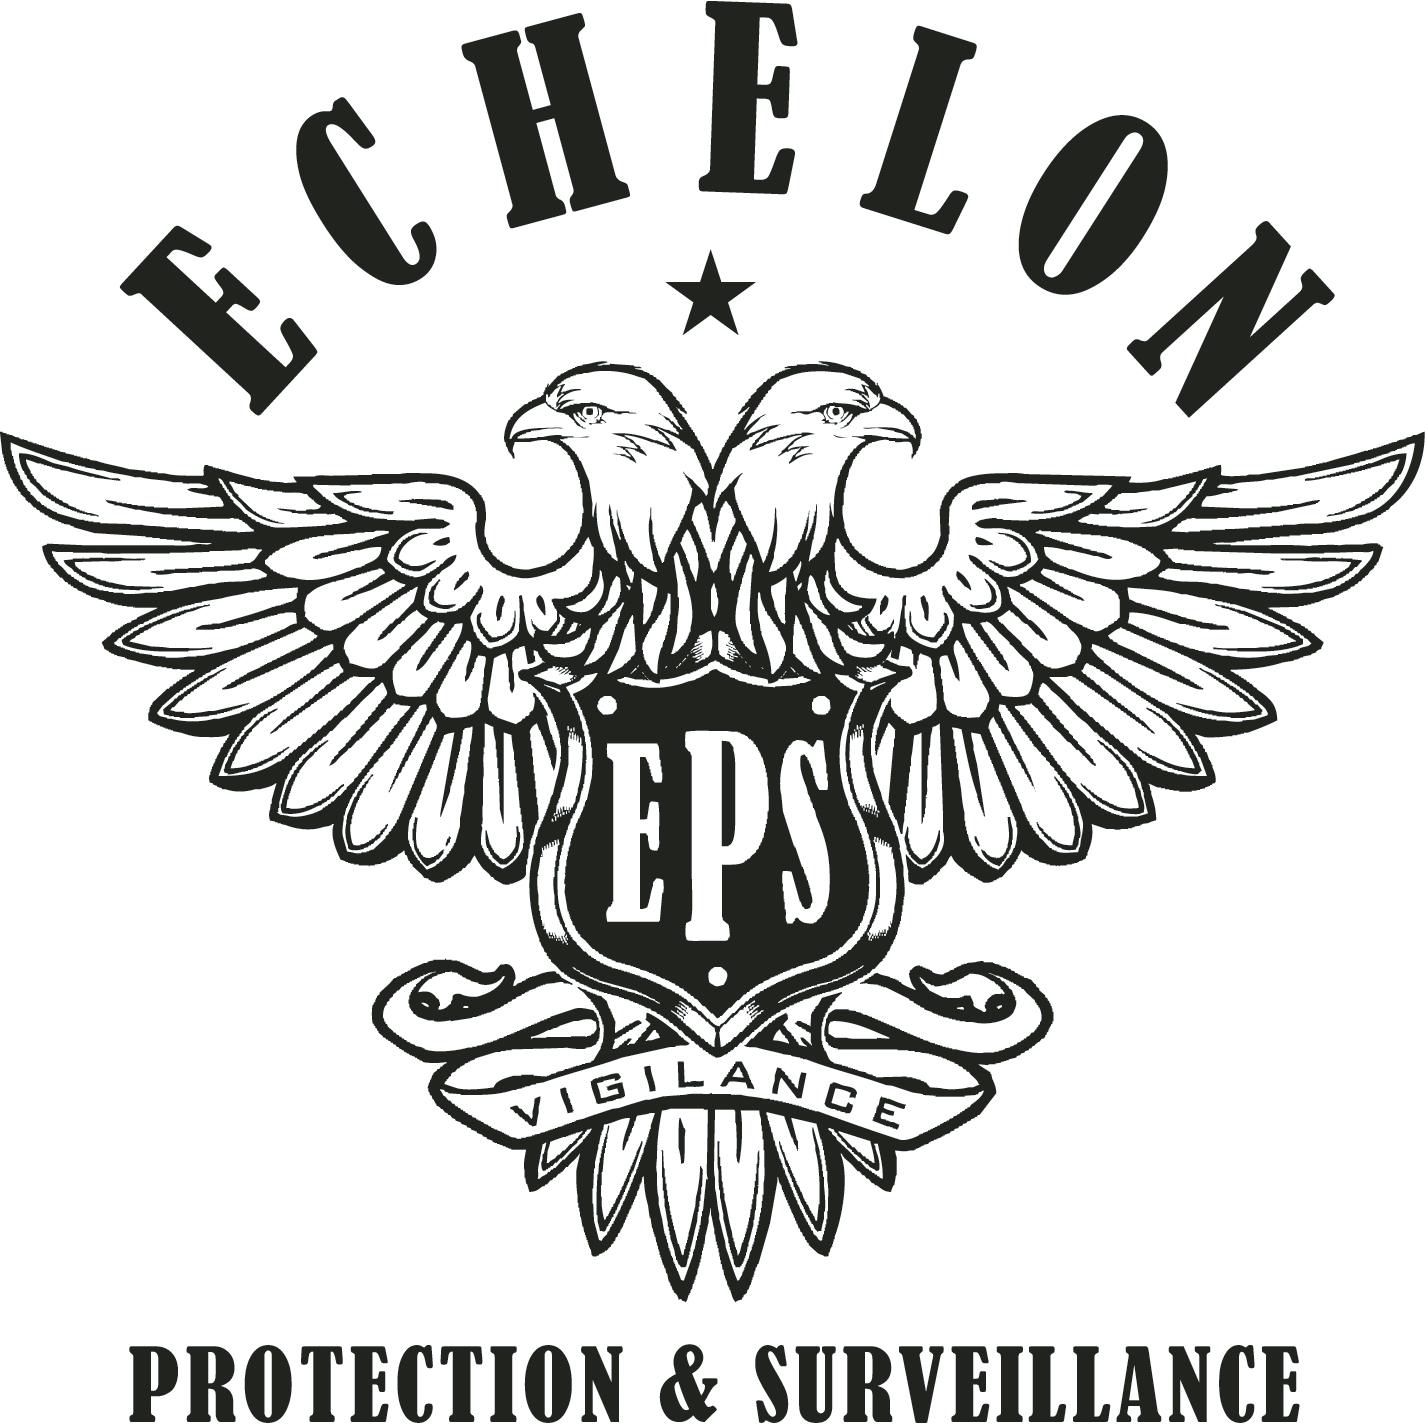 Echelon Protection & Surveillance